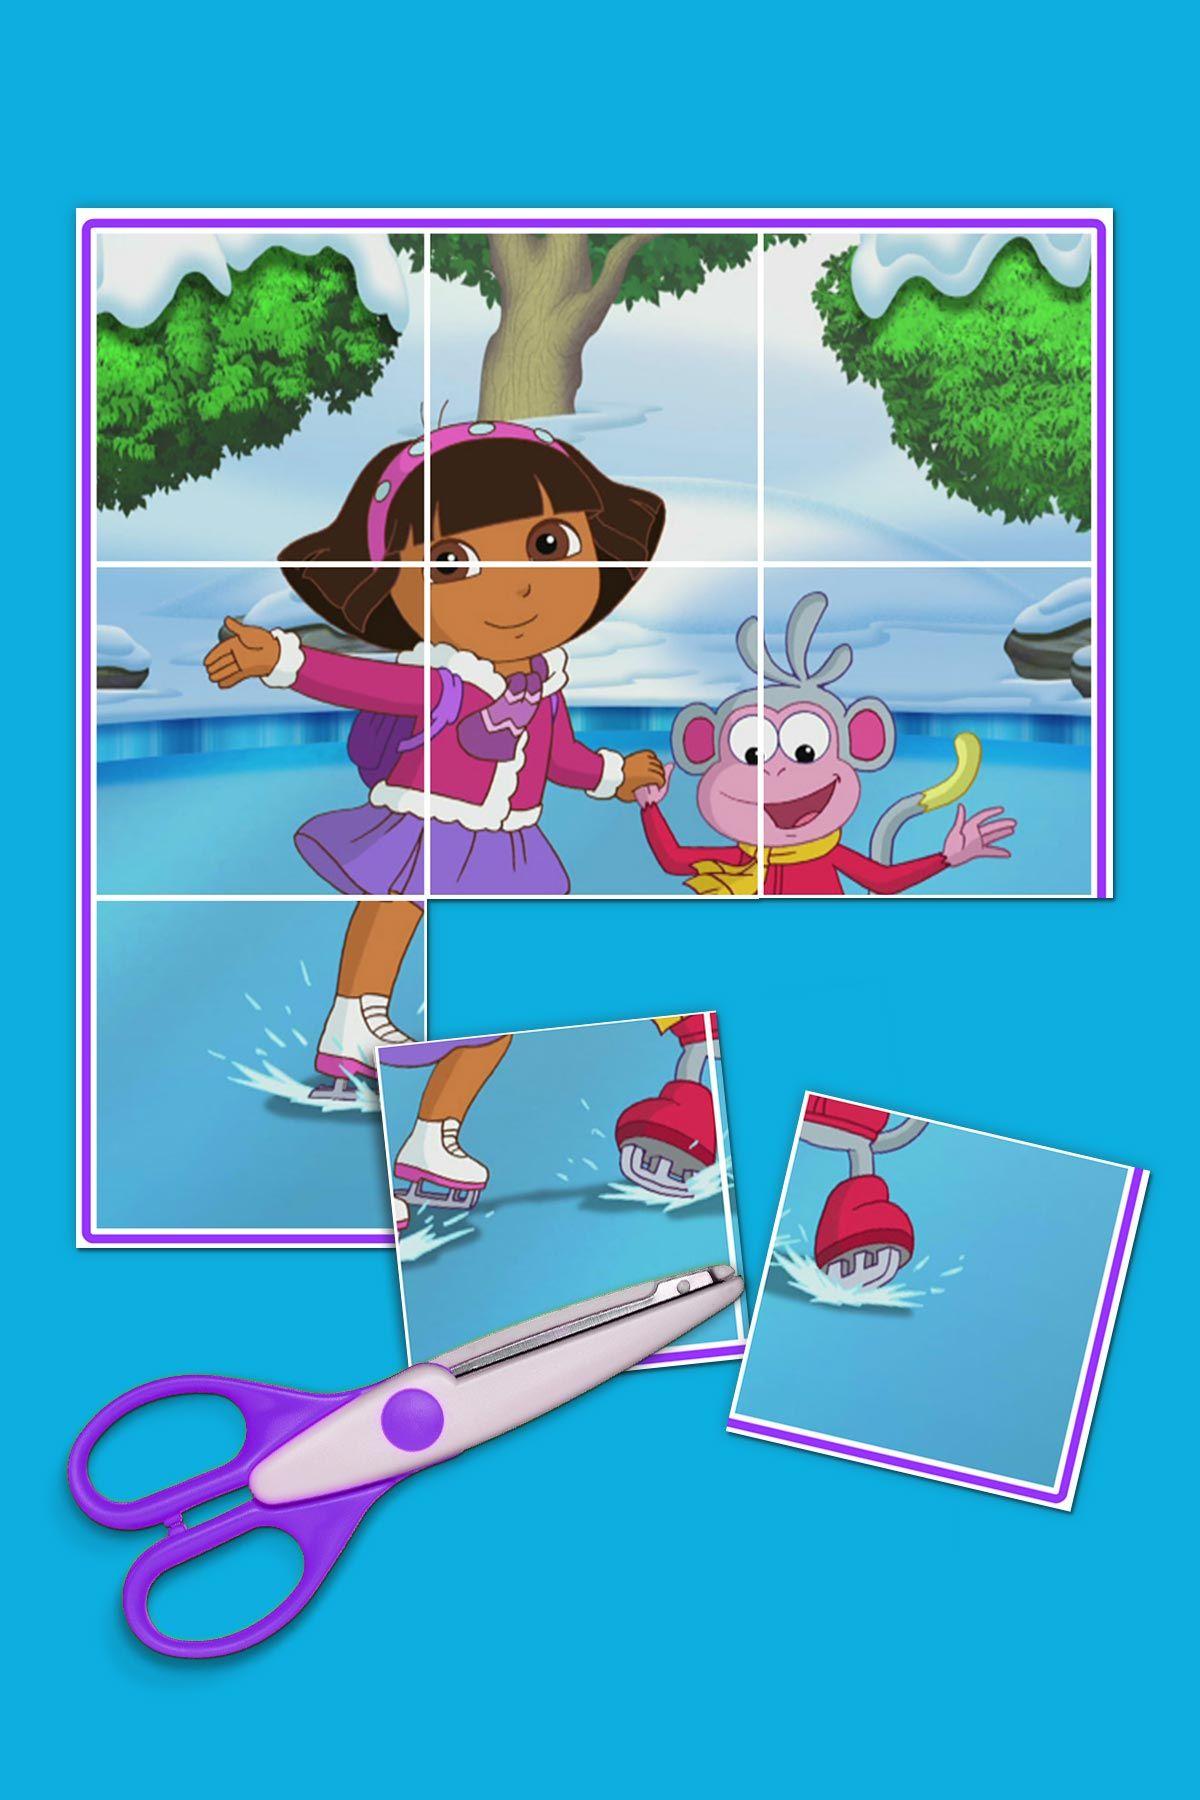 Dora And Boots Ice Skating Puzzle Dora Preschool Printables Ice Skating [ 1800 x 1200 Pixel ]